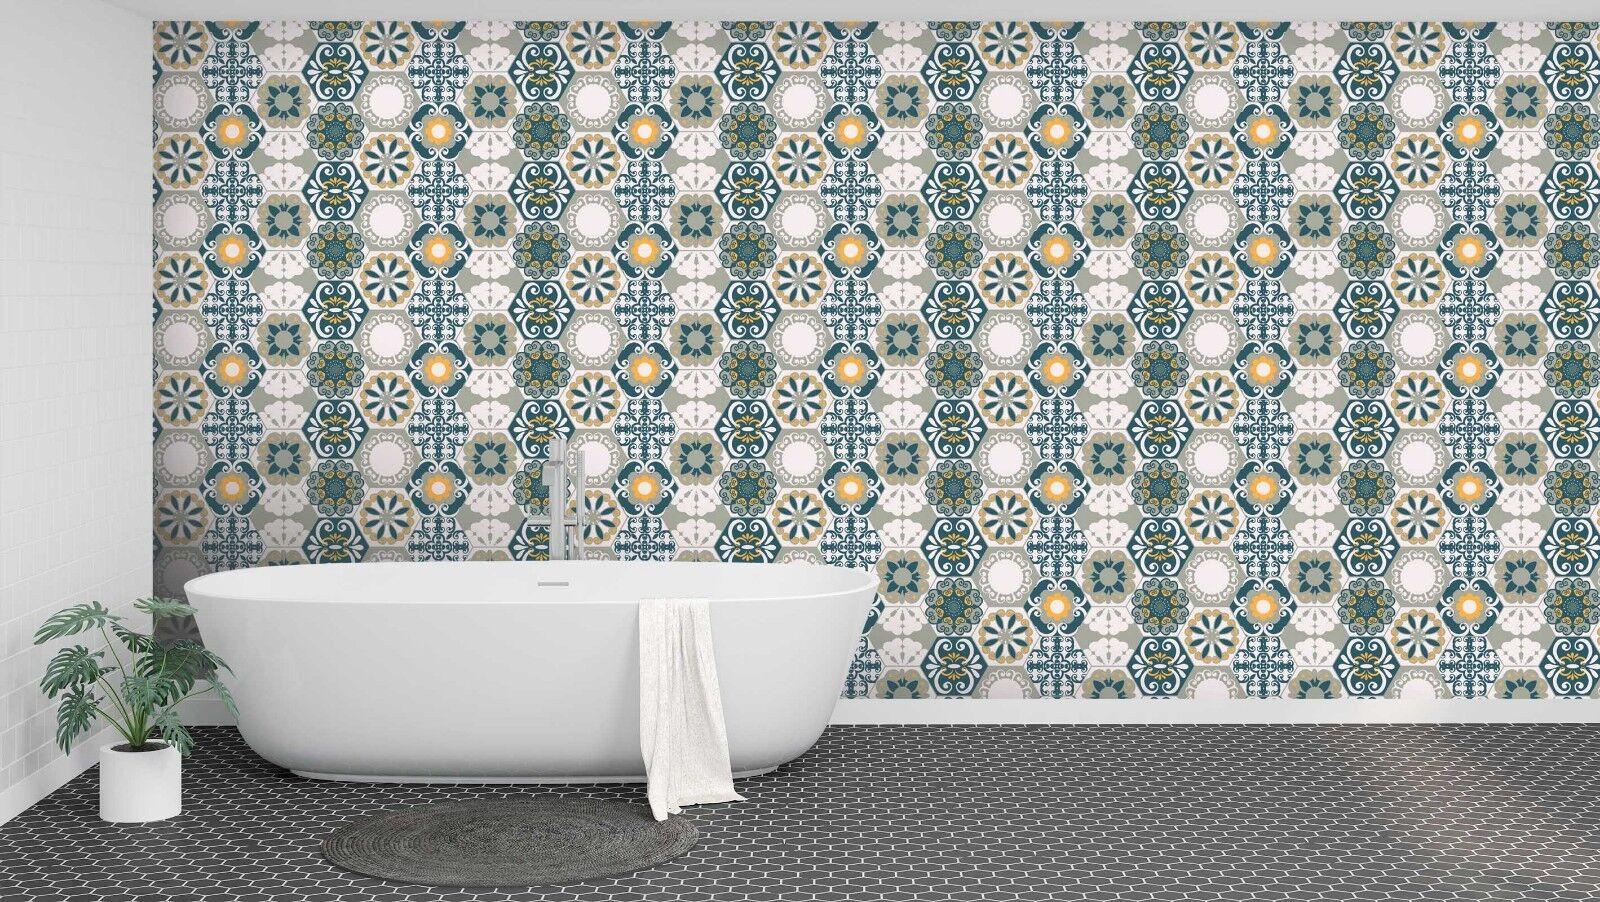 3D Hübsch Blaumen Kunst 3 Textur Fliesen Marmor Tapete Abziehbild Tapete Wandbild